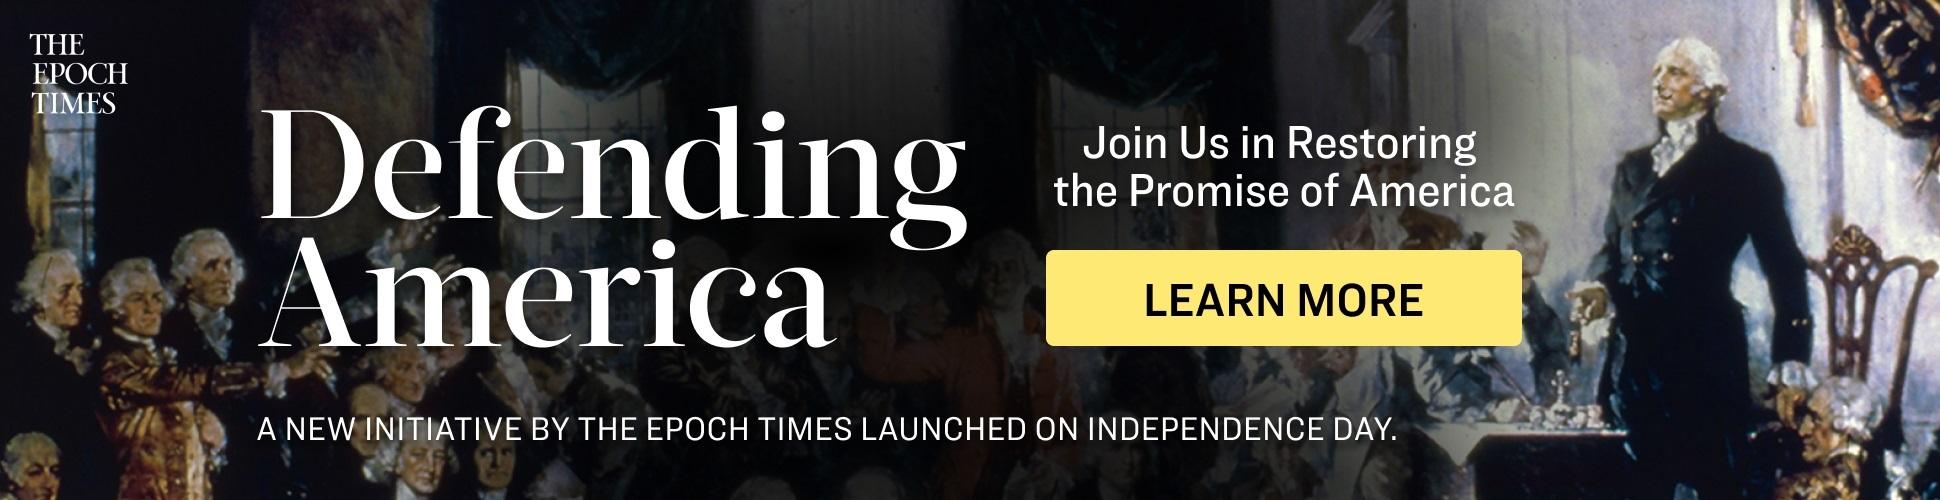 Defending America event banner